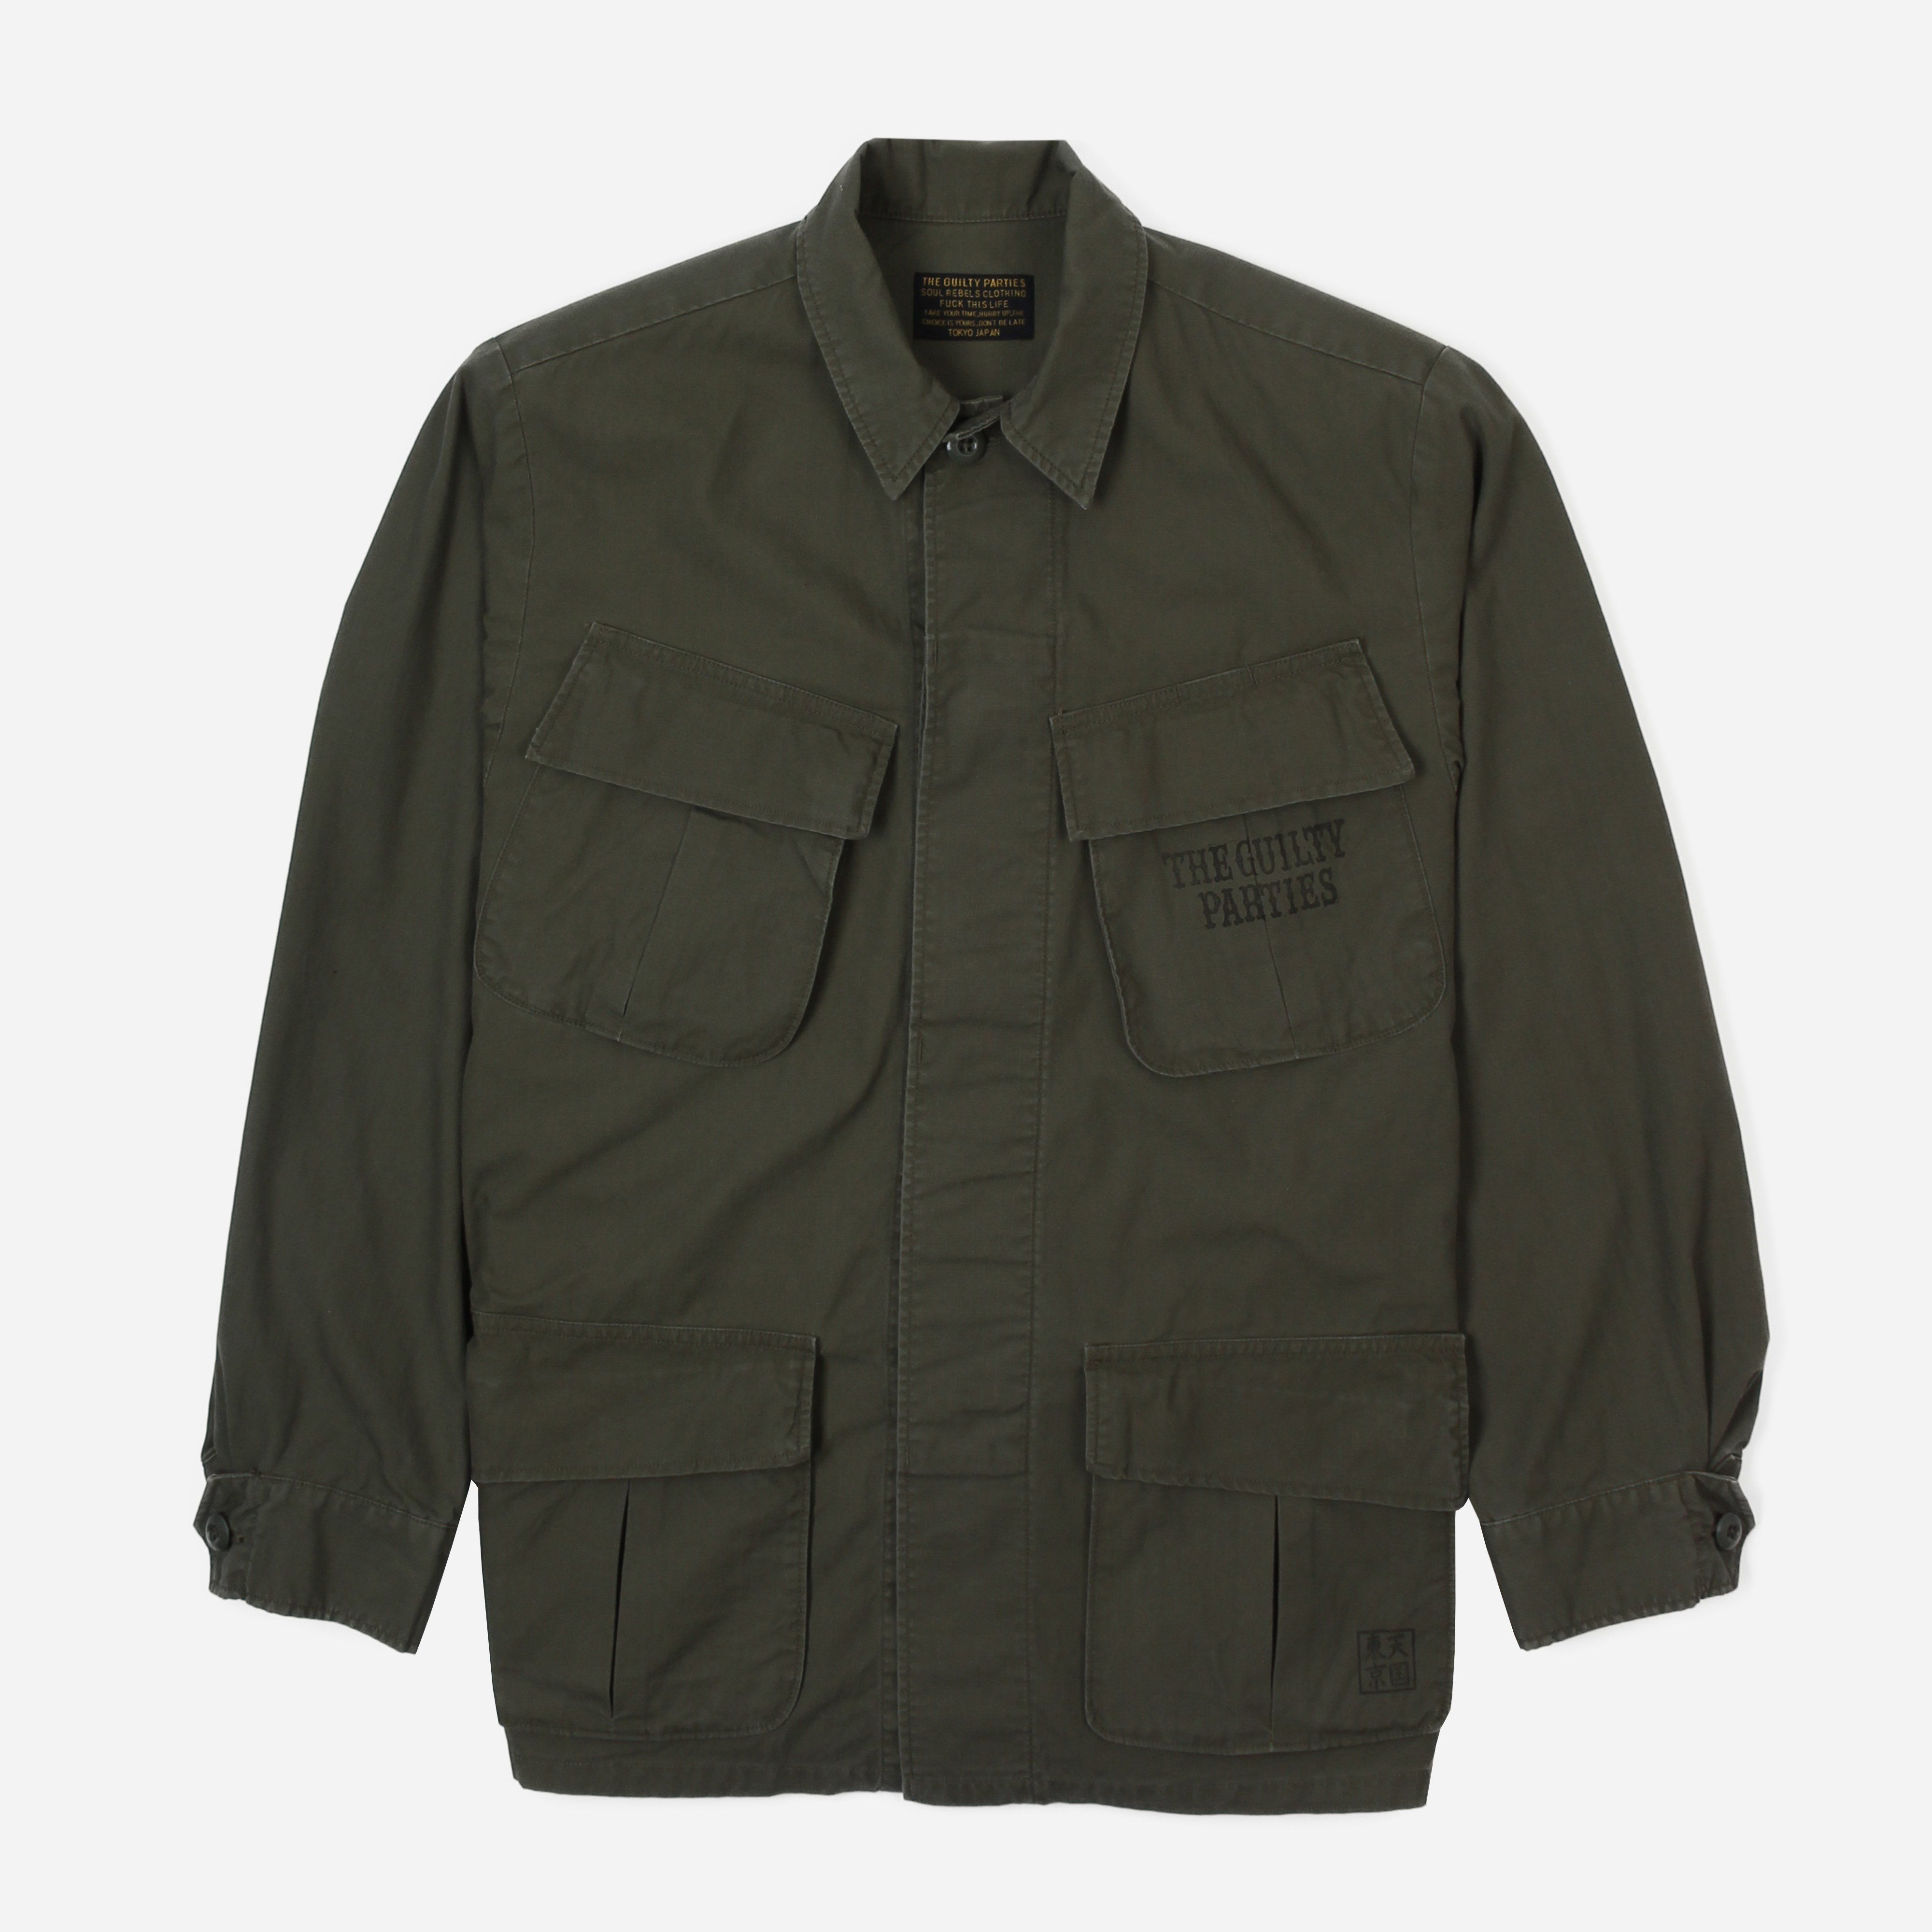 Wacko Maria Fatigue Jacket Type 3